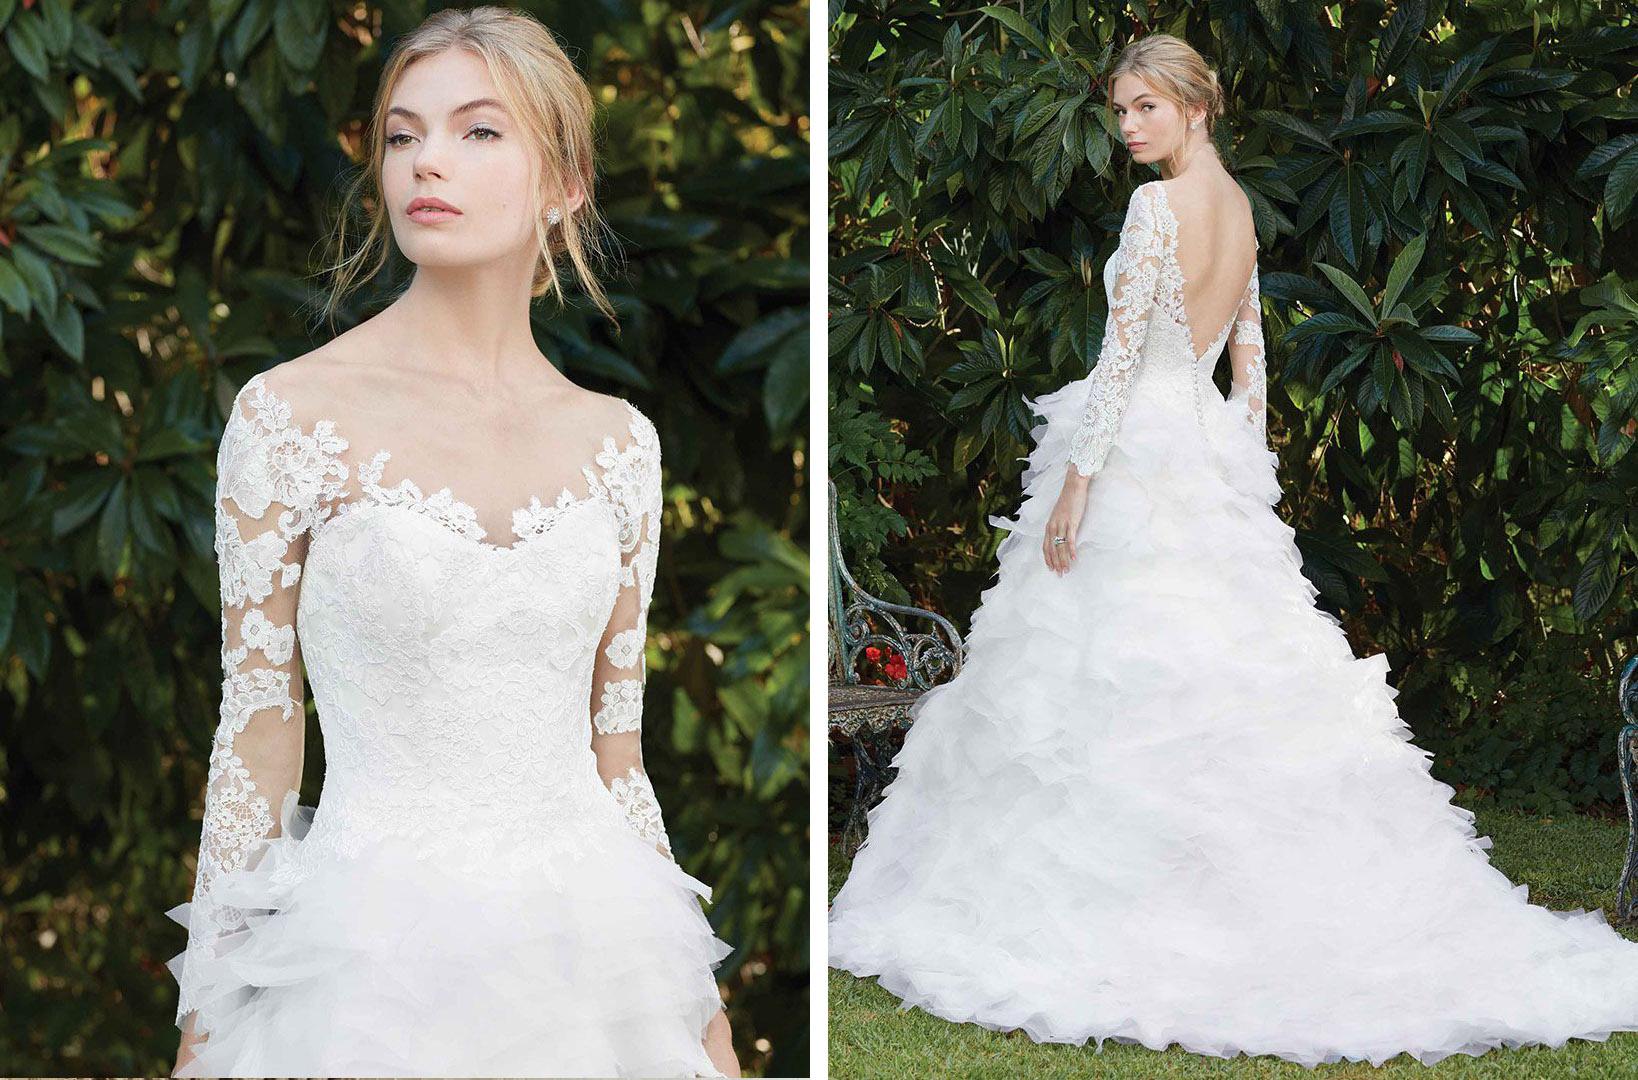 Top Ruffled Wedding Dresses By Casablanca Bridal / Blog